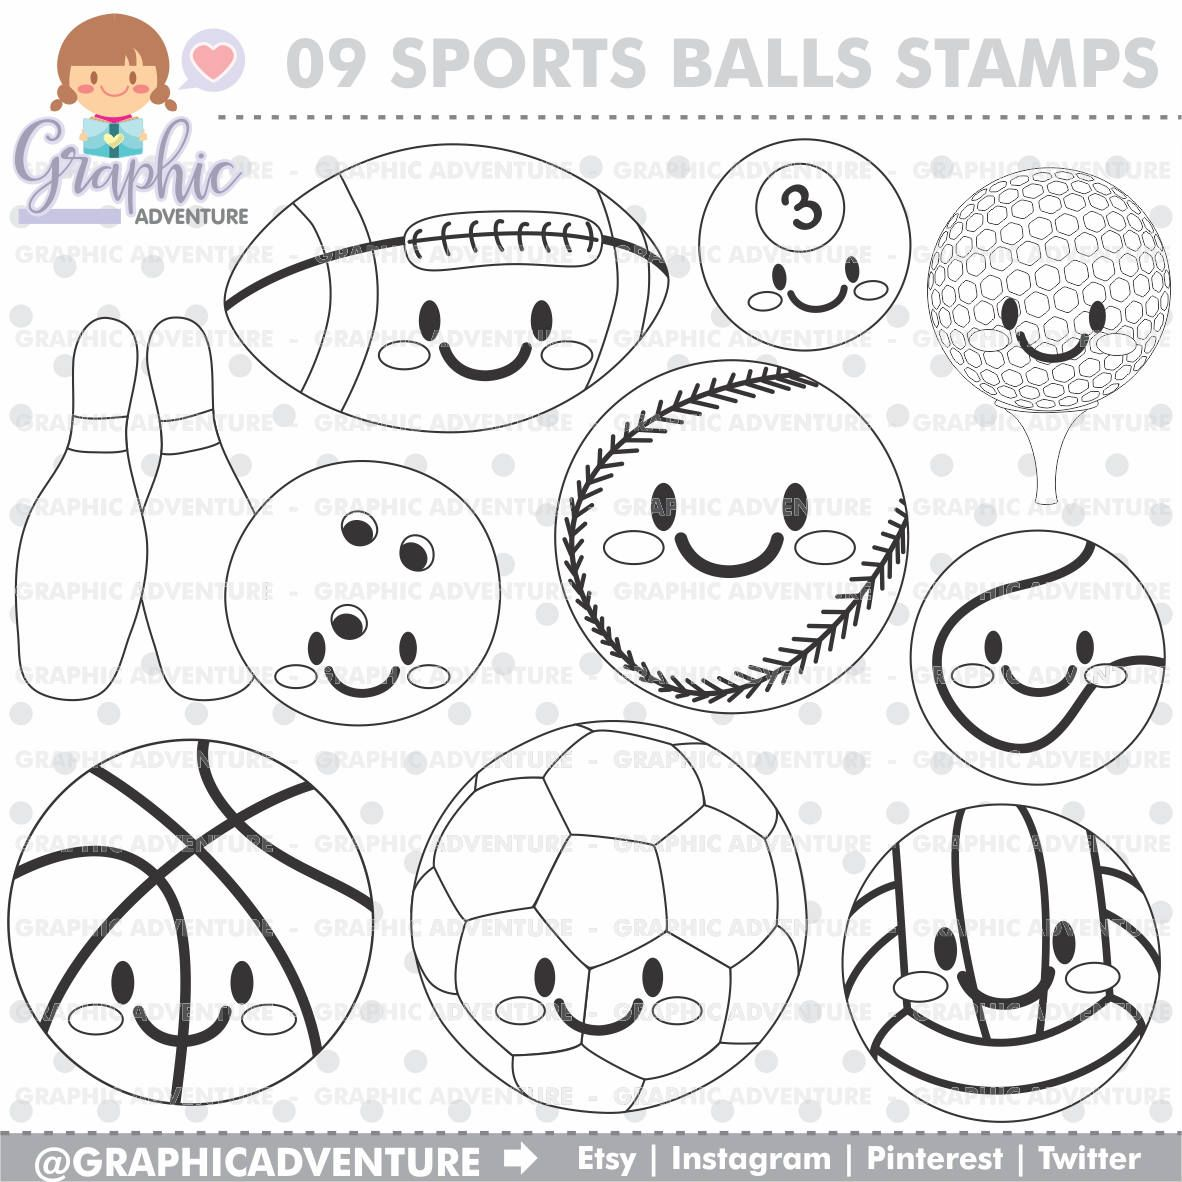 Sport Stamp Commercial Use Digi Stamp Digital Image Party Digistamp Sport Coloring Page Sports Clipart Sport Graphics Sports Coloring Pages Digi Stamp Coloring Pages